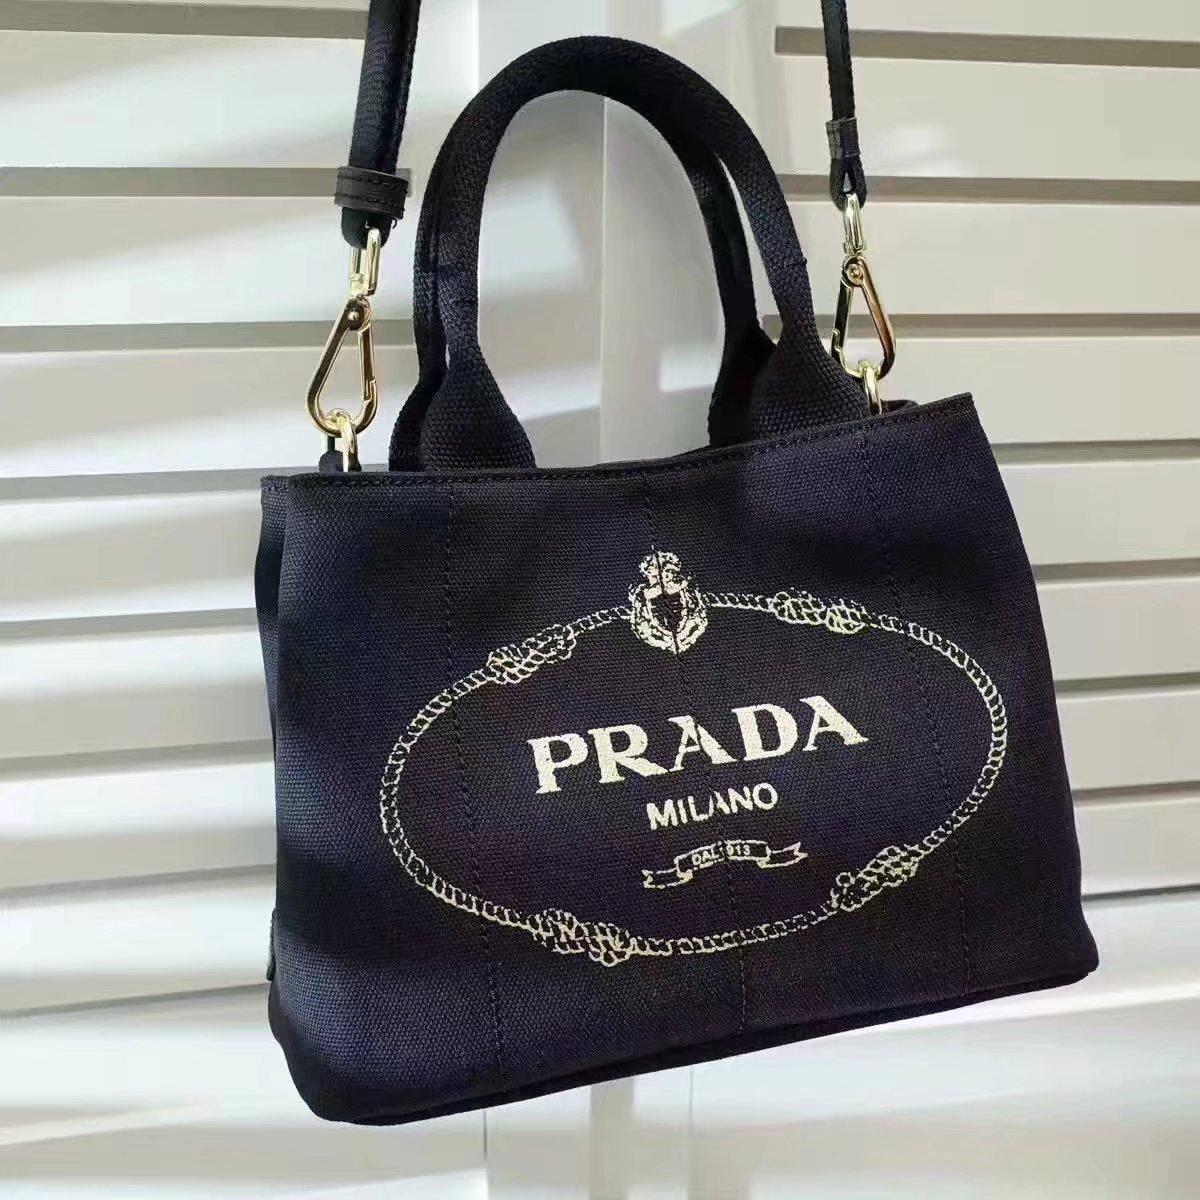 Prada Top Handle Canvas Cowboy Shopping Bag Black